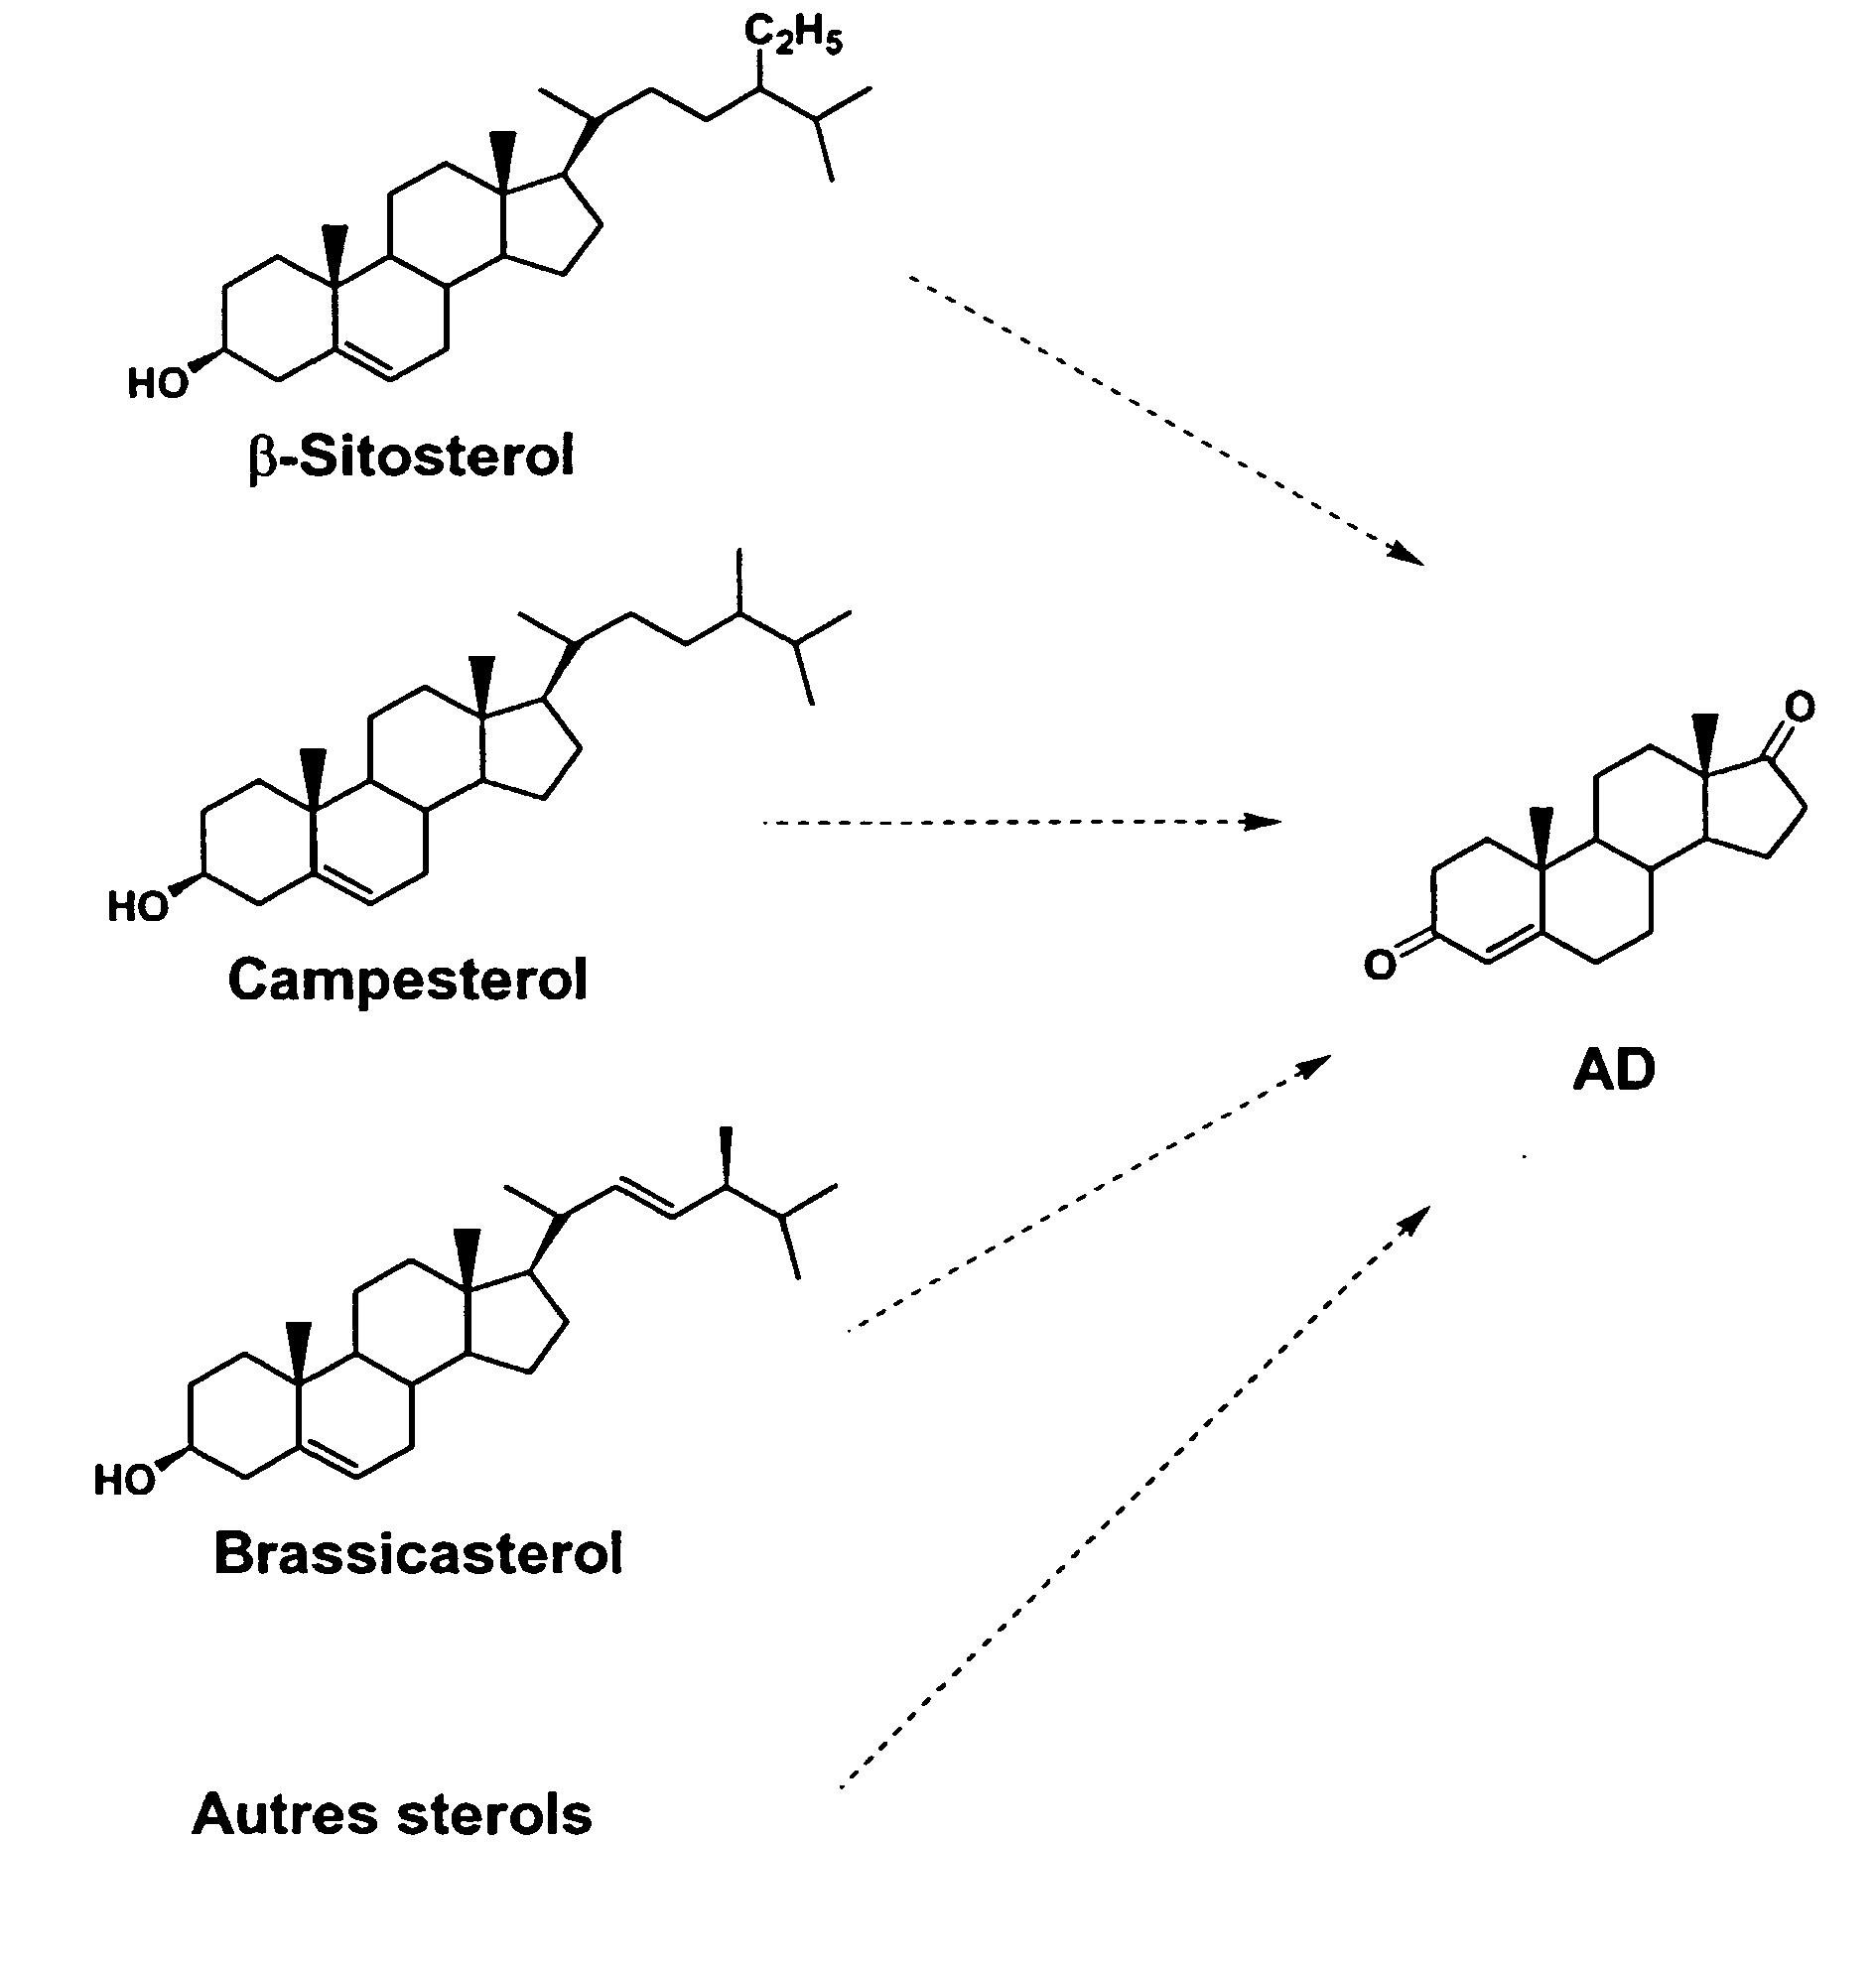 bioconversion of steroids